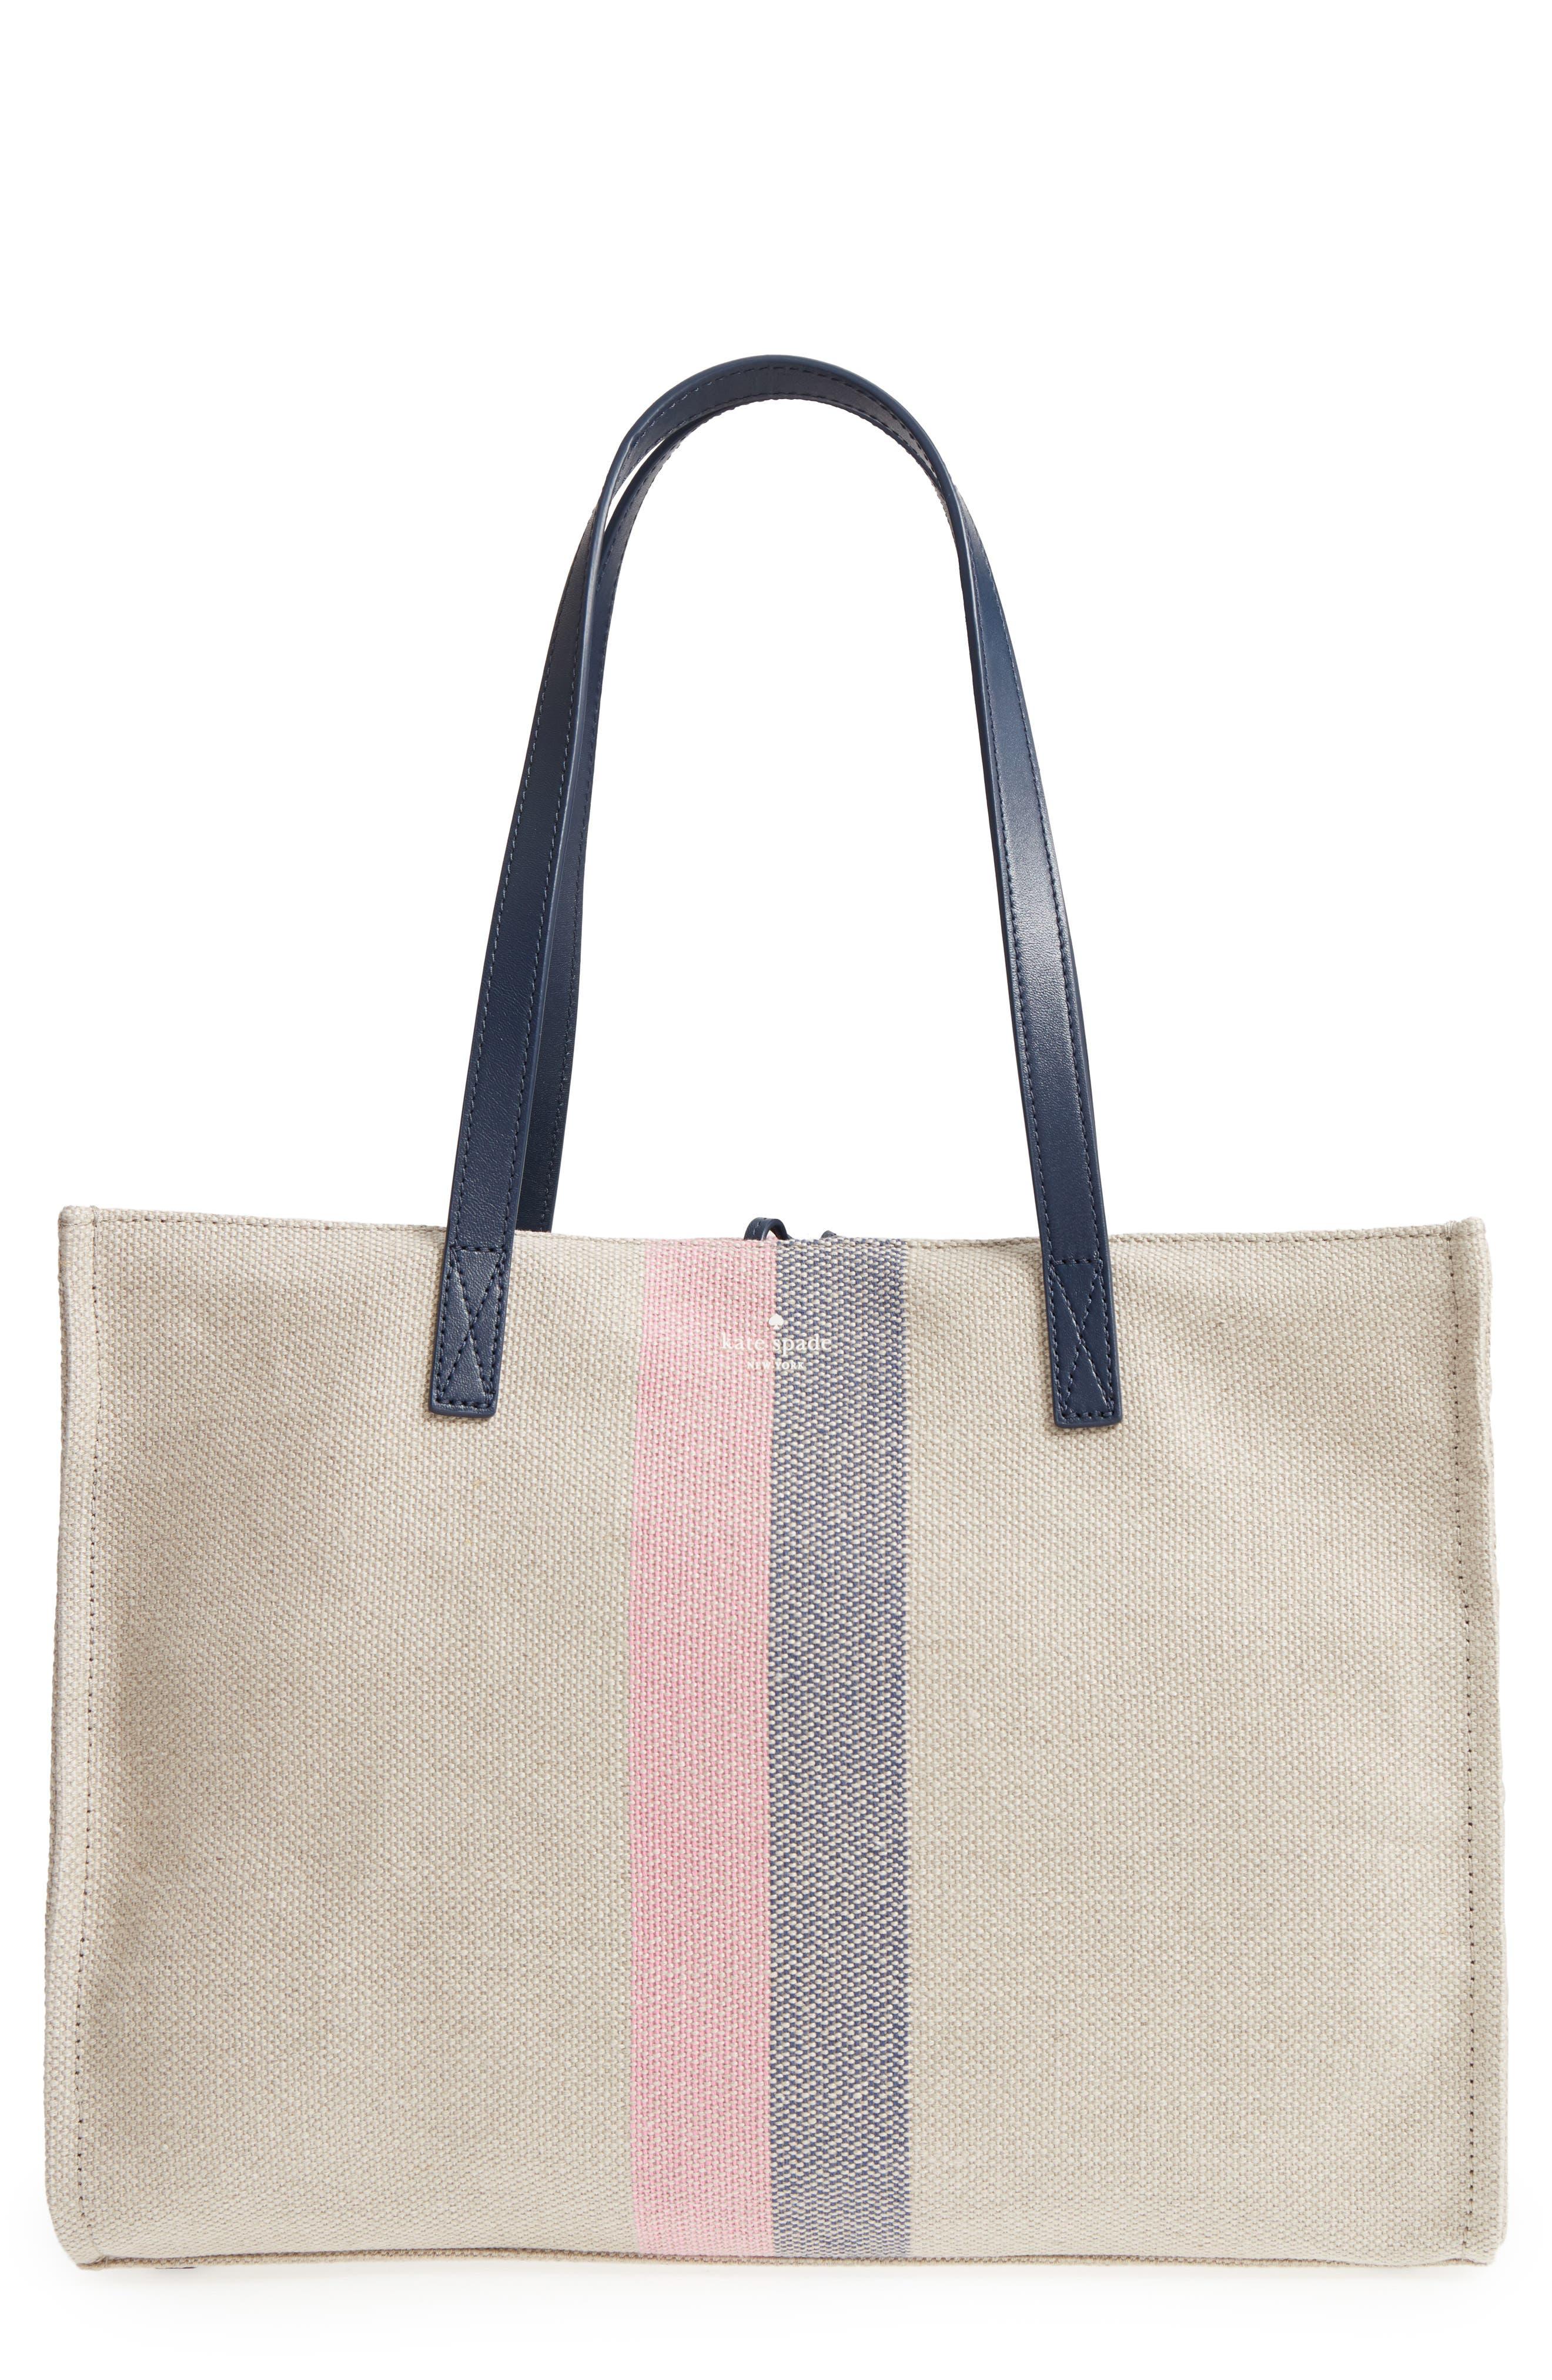 washington square - mega sam canvas satchel,                             Main thumbnail 1, color,                             Natural Linen/Bubble Gum/Navy